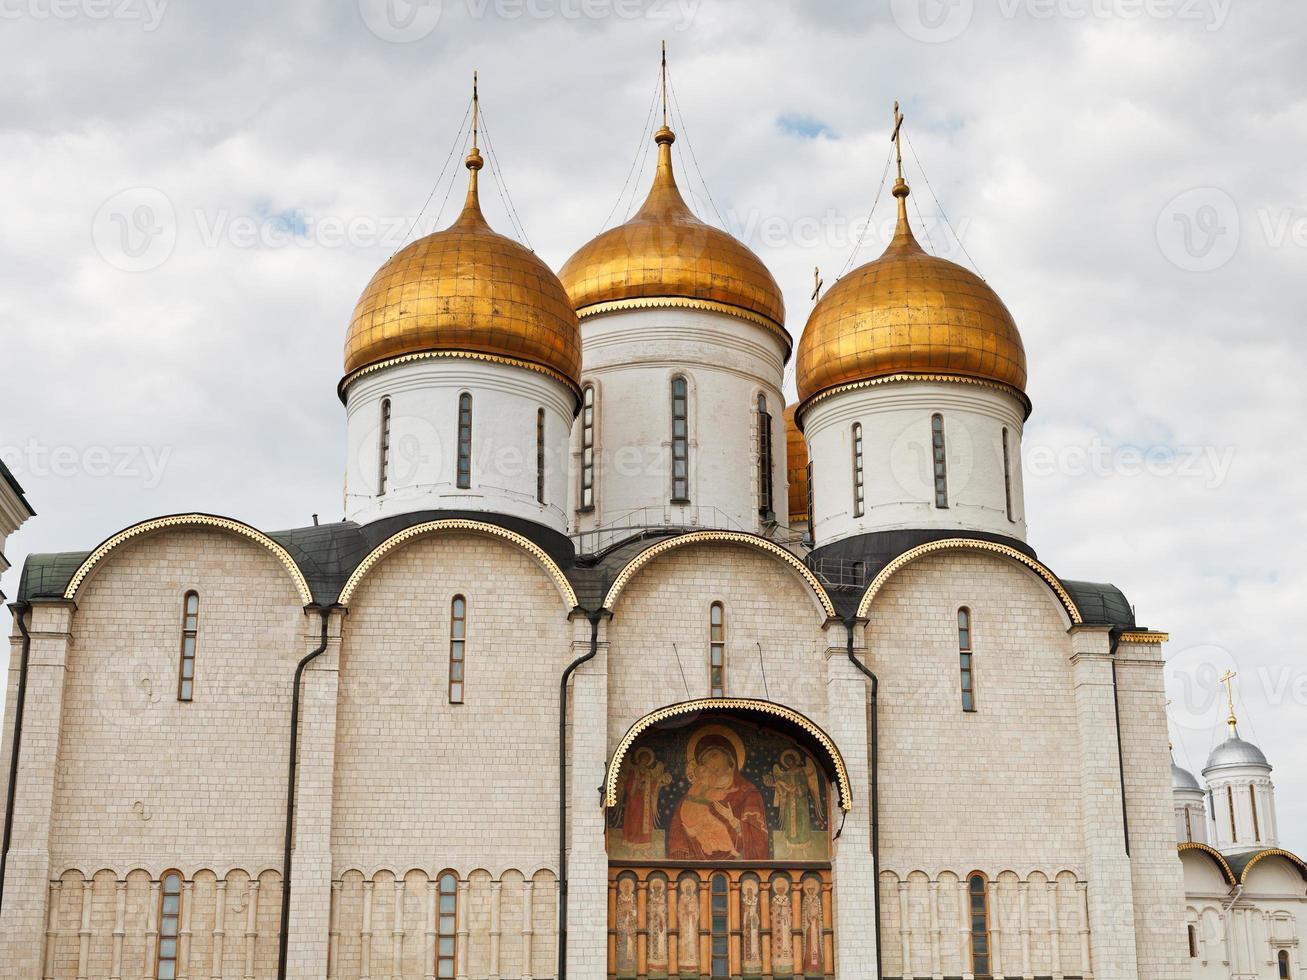 dormition kathedraal in het kremlin van moskou foto